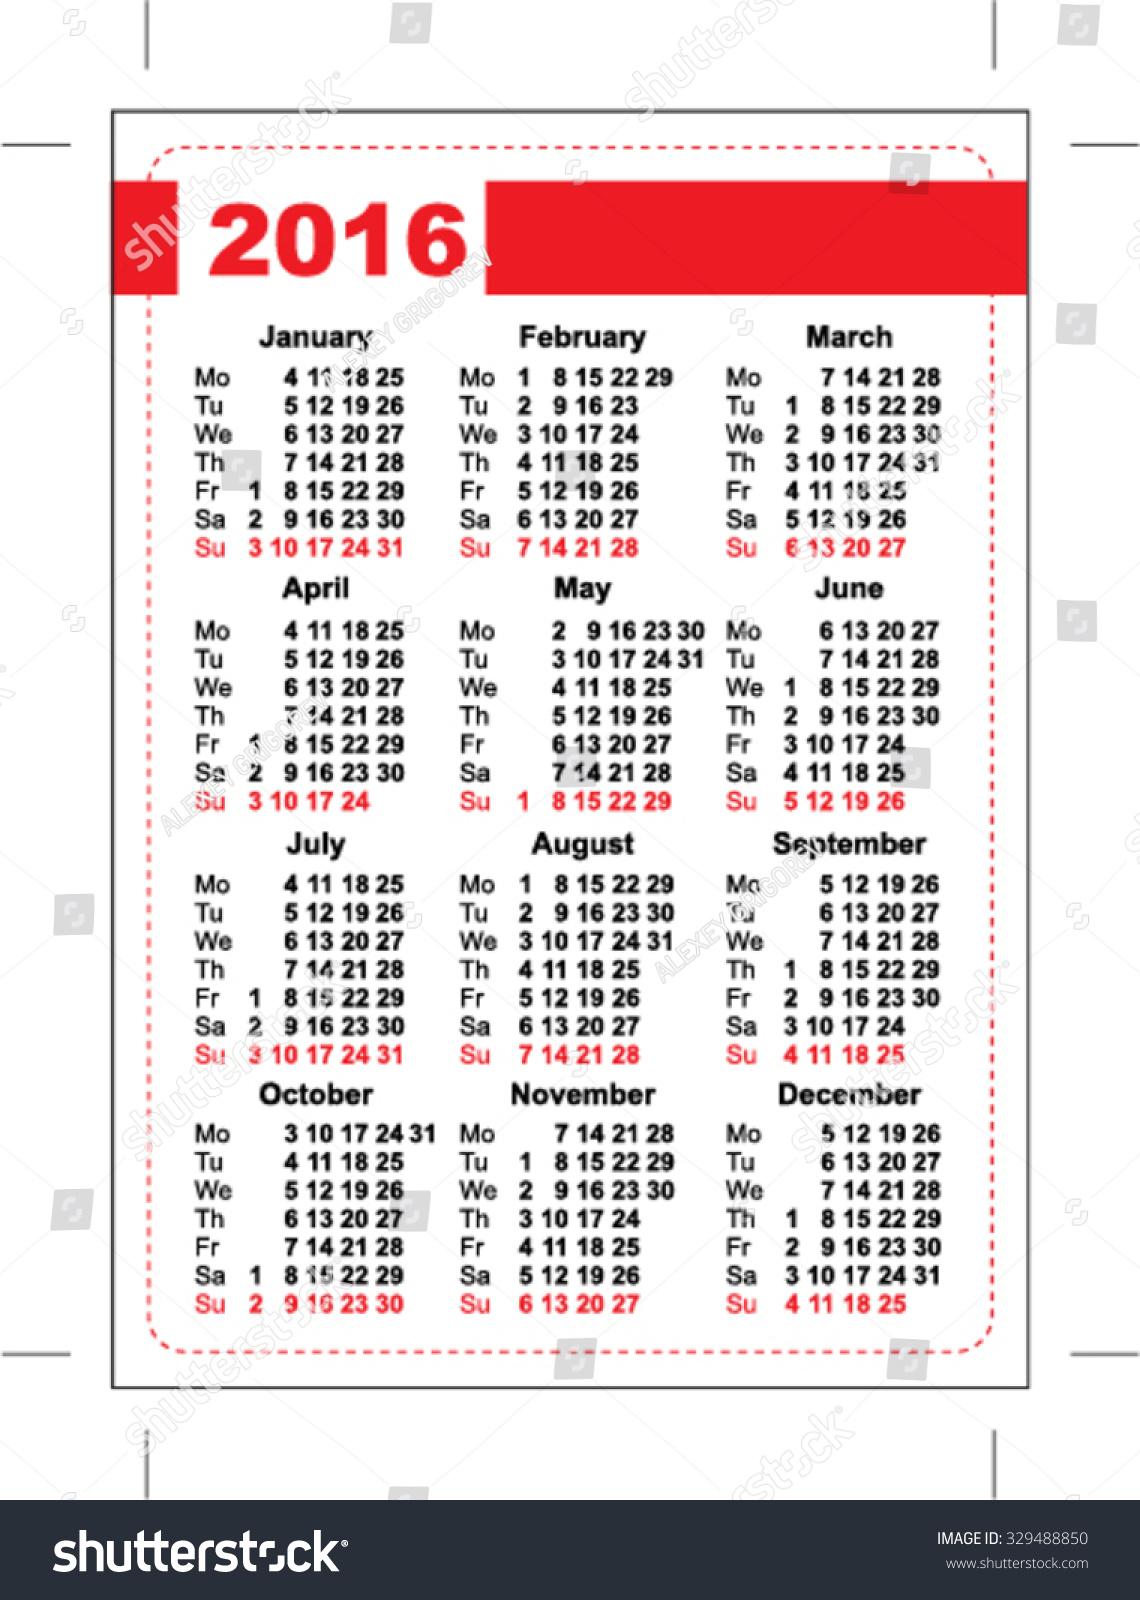 2016 Pocket Calendar Template Calendar Grid Stock Vector 329488850 ...